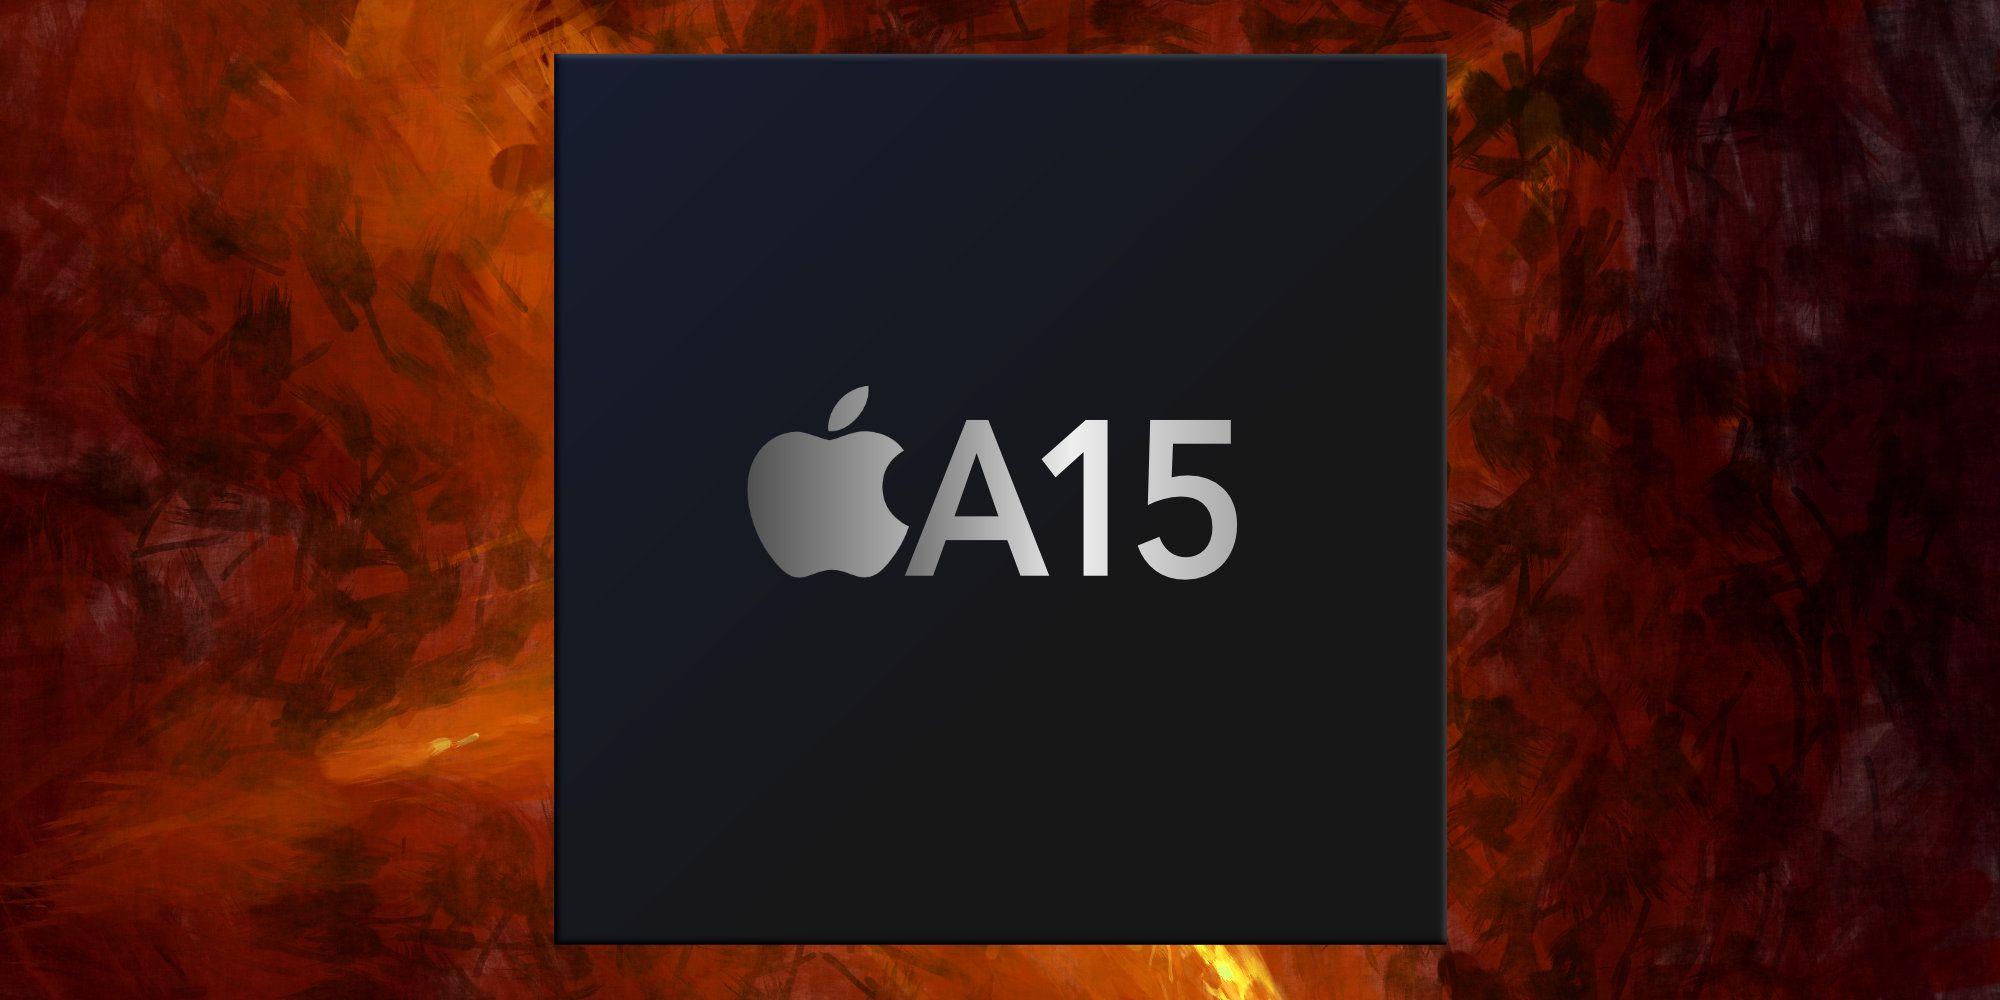 Bionic A15 flagship processor